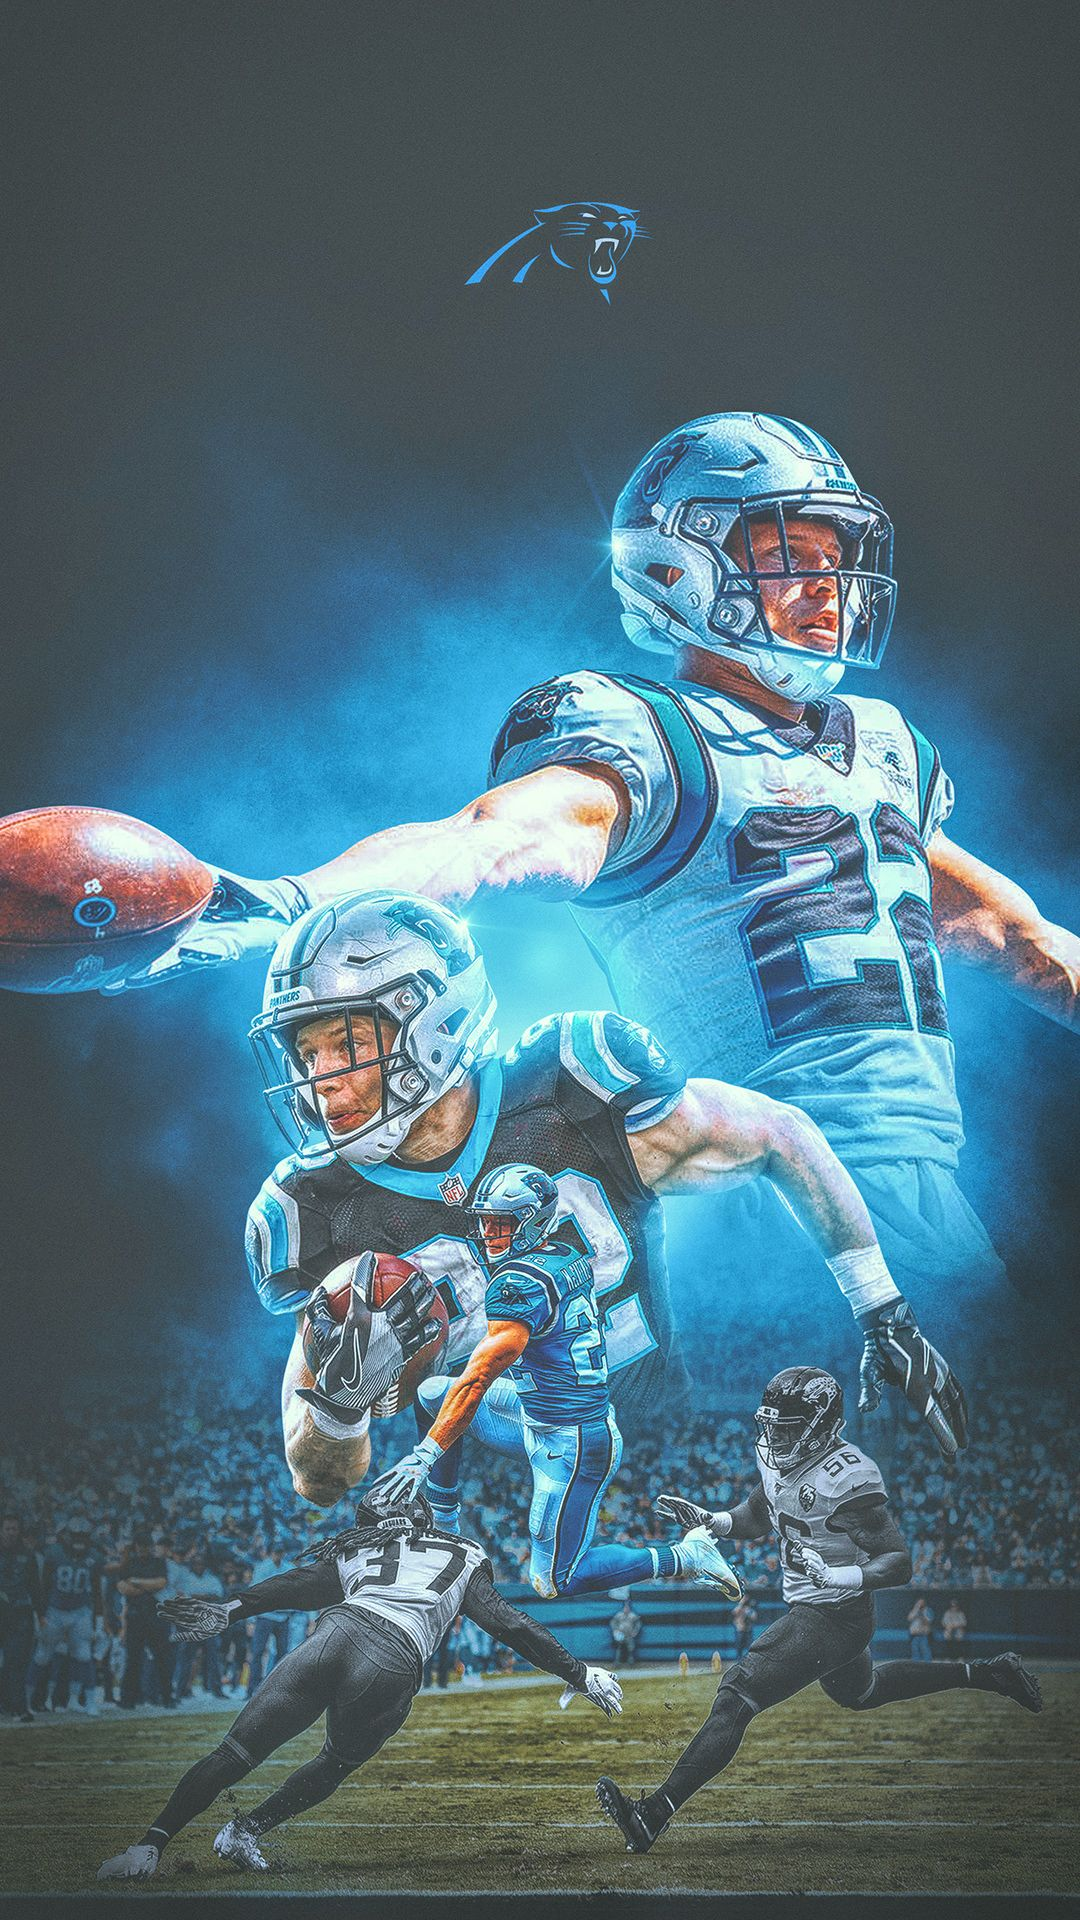 Behance For You Nfl Football Art Nfl Football Wallpaper Panthers Football